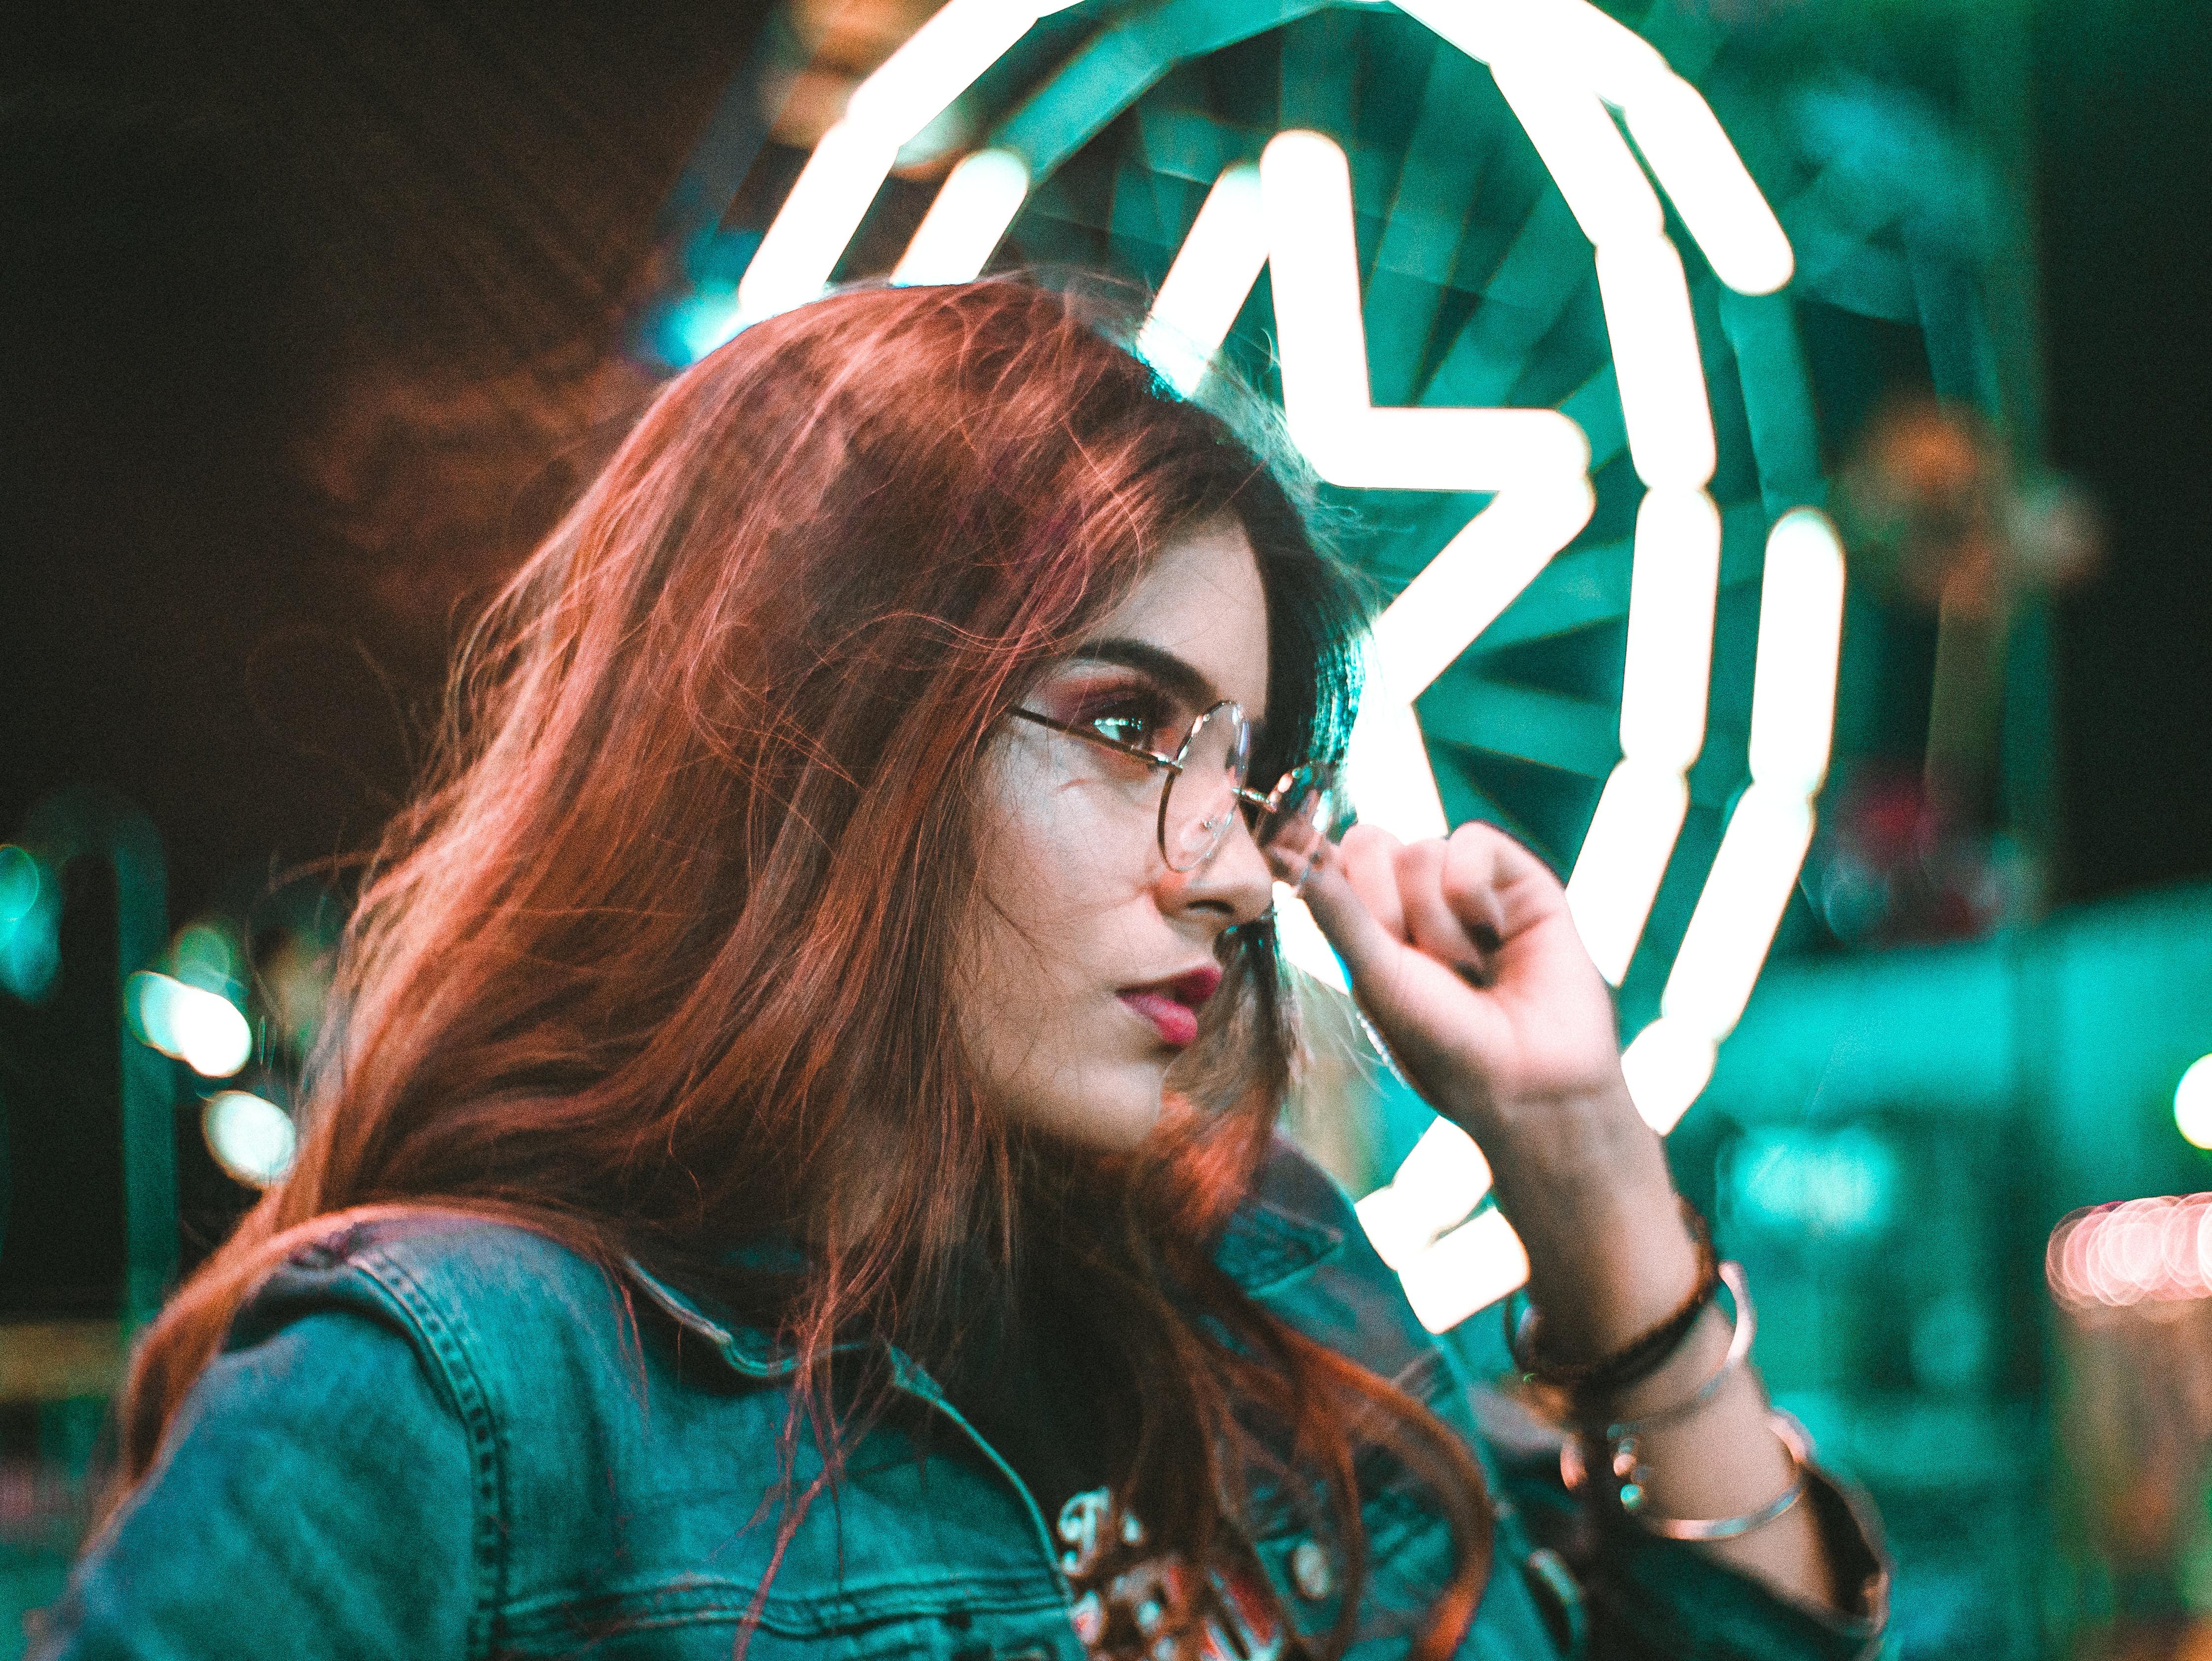 woman touching eyeglasses